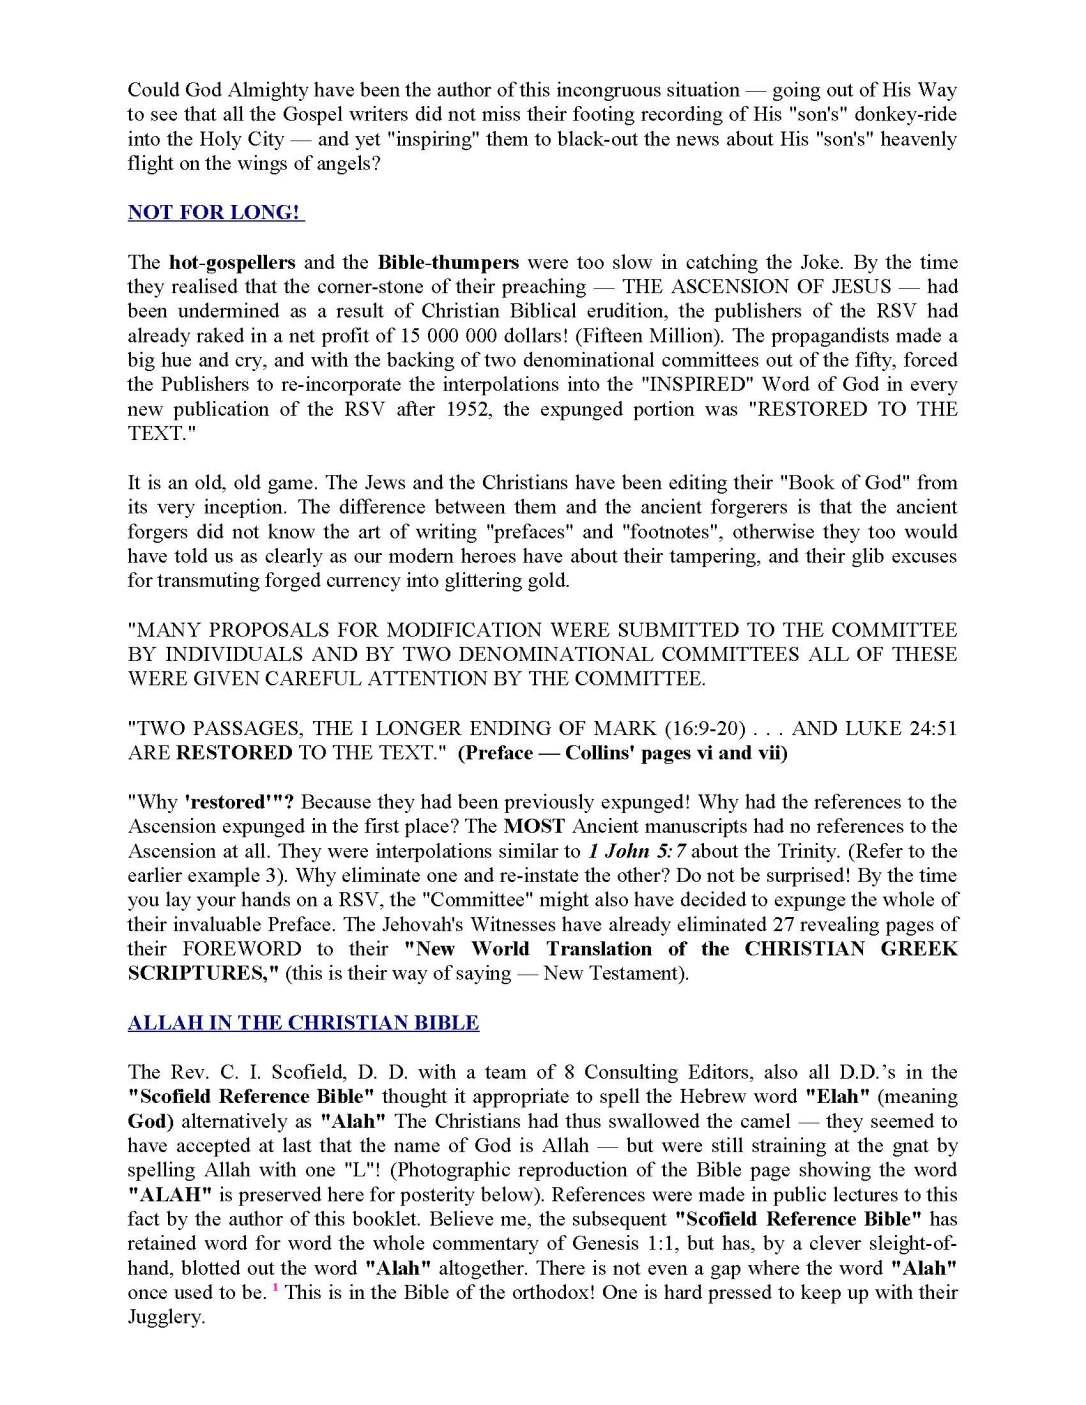 Is The Bible Gods Word [deedat]_Page_16